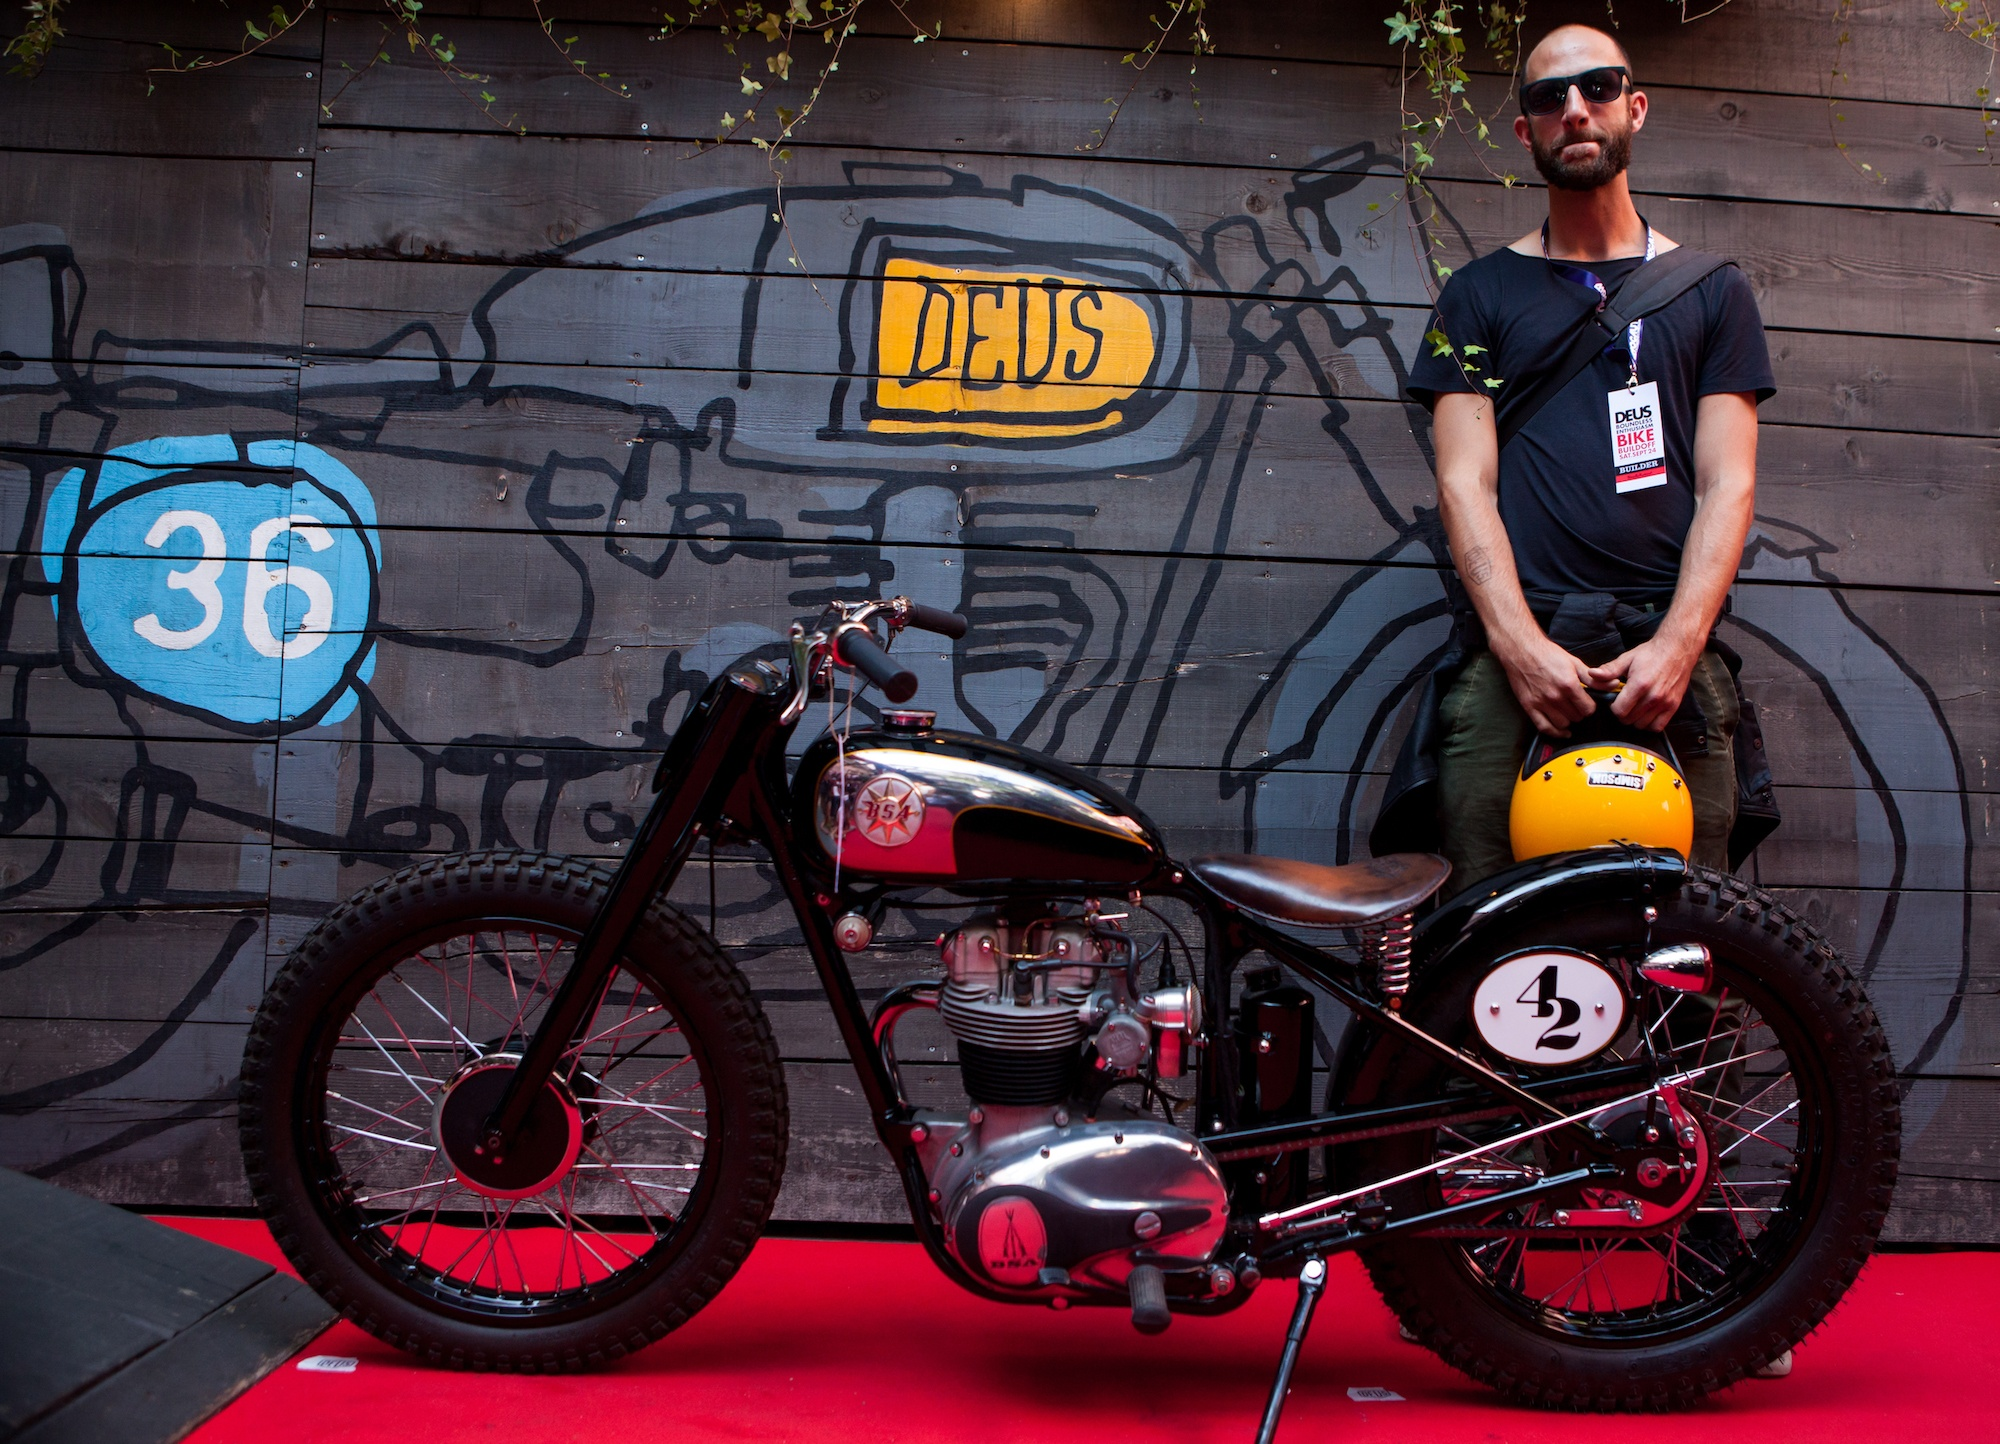 Deus Bike Build Off 2016 cover